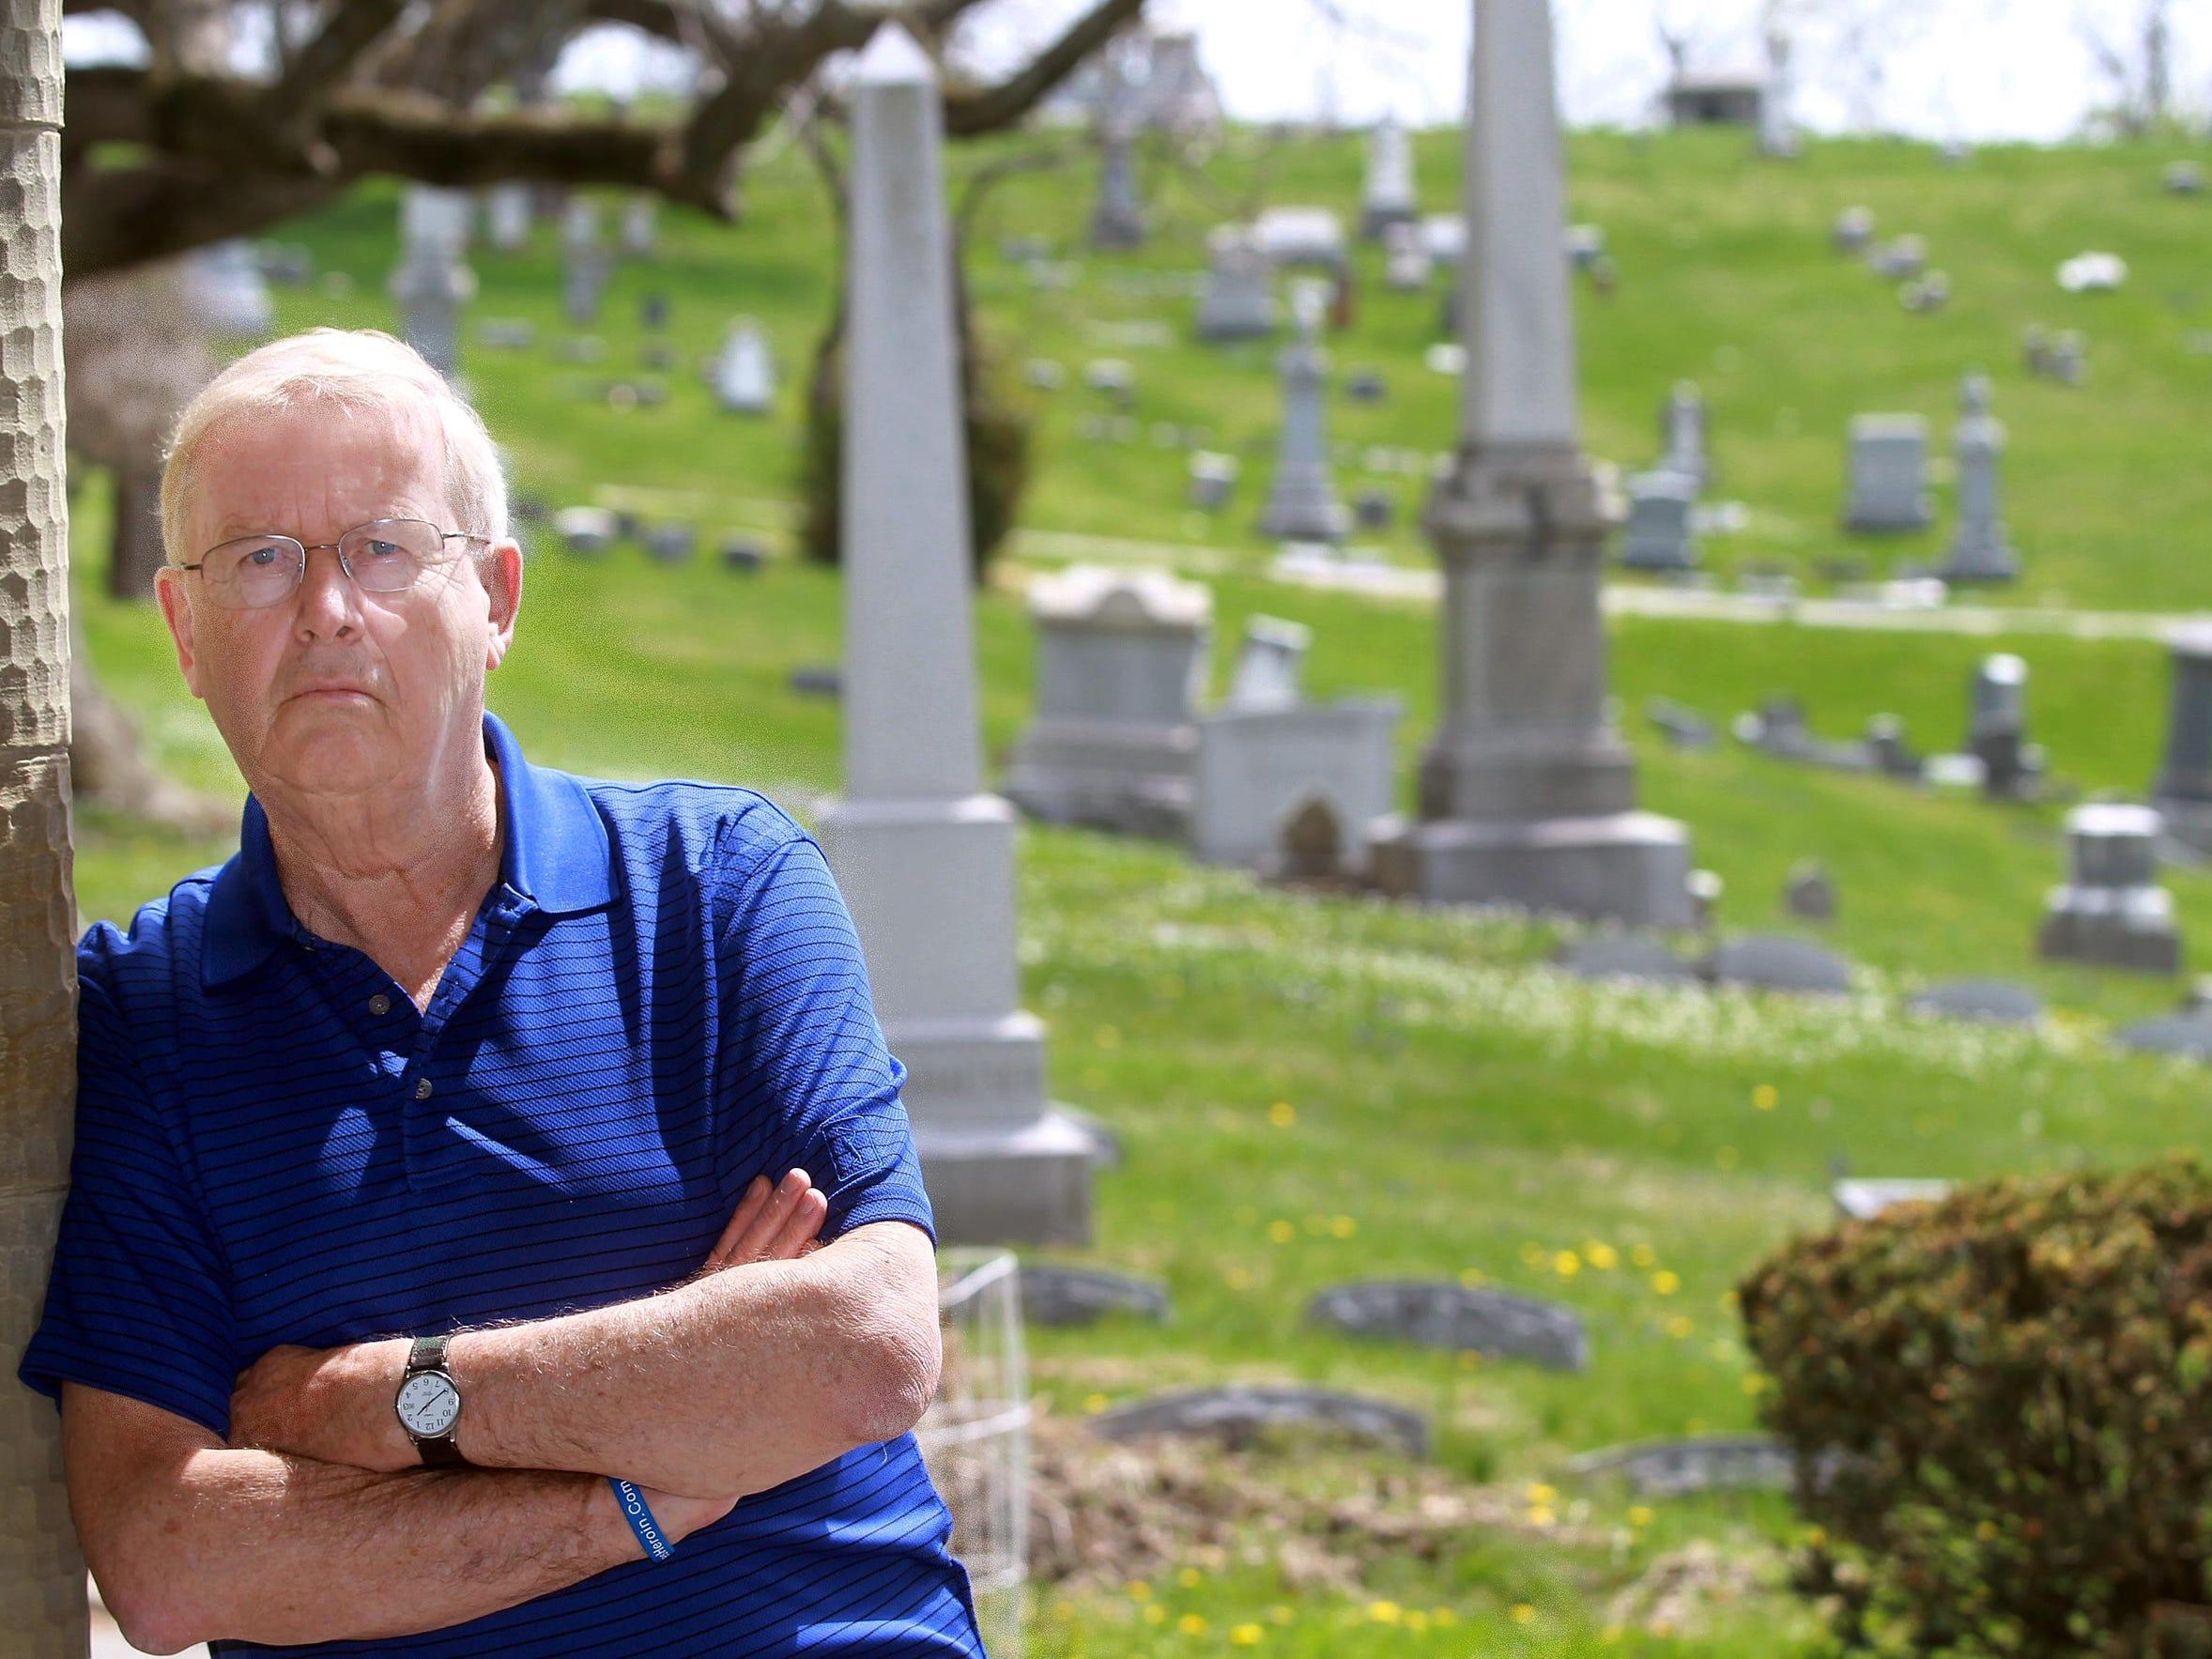 Noel Stegner of Fort Thomas stands in Evergreen Cemetery